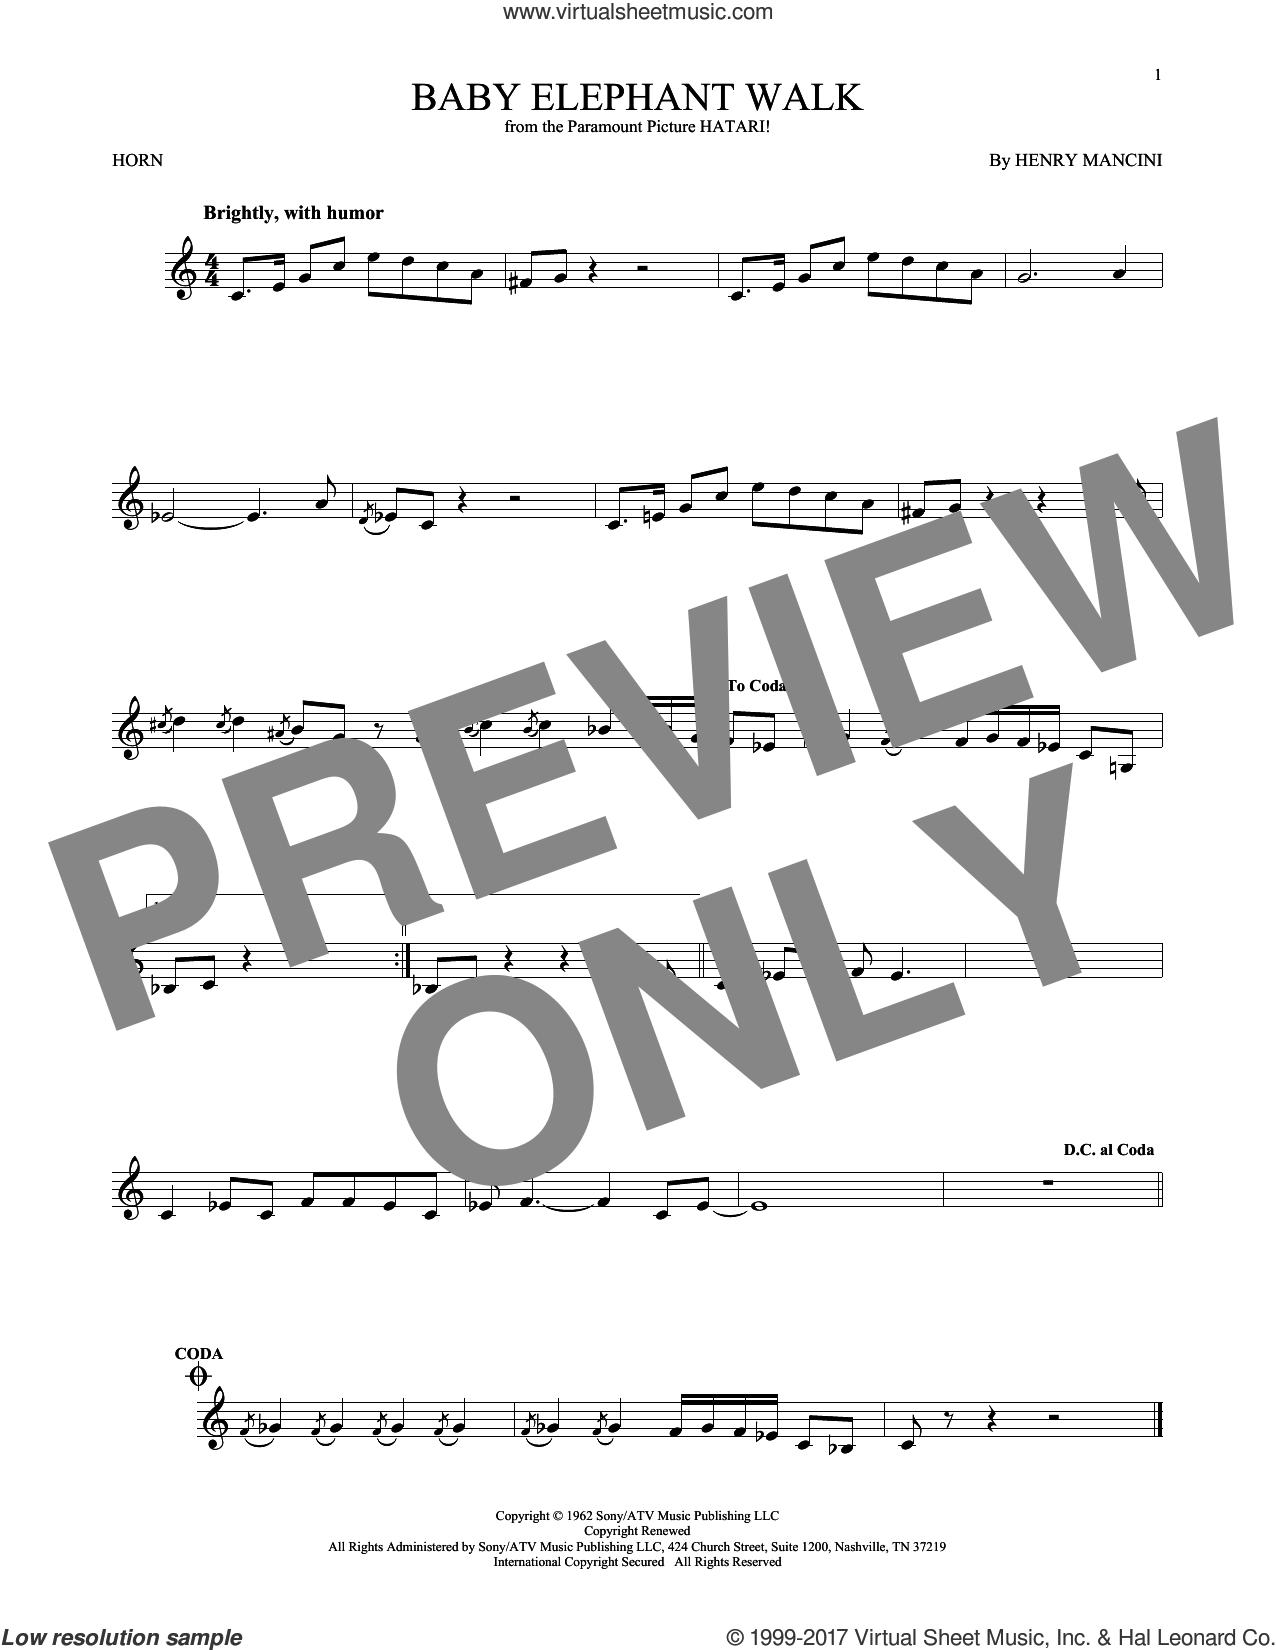 Baby Elephant Walk sheet music for horn solo by Henry Mancini, intermediate skill level